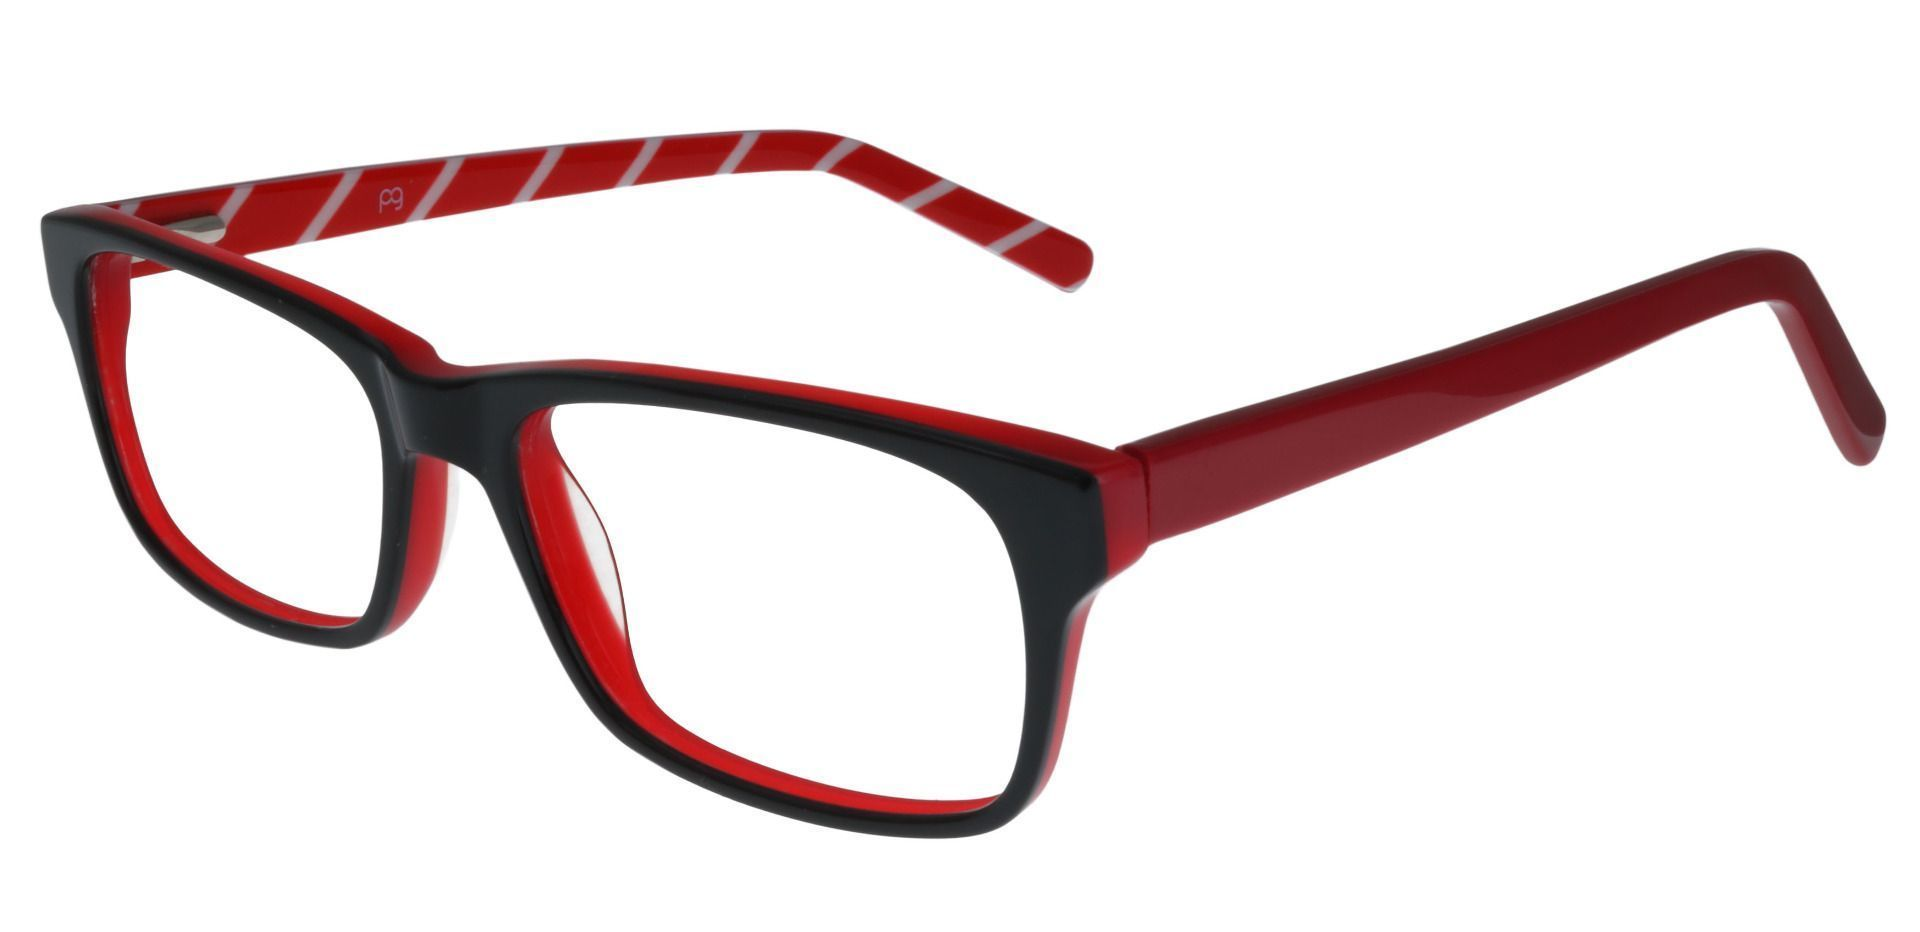 Petra Rectangle Prescription Glasses - Red